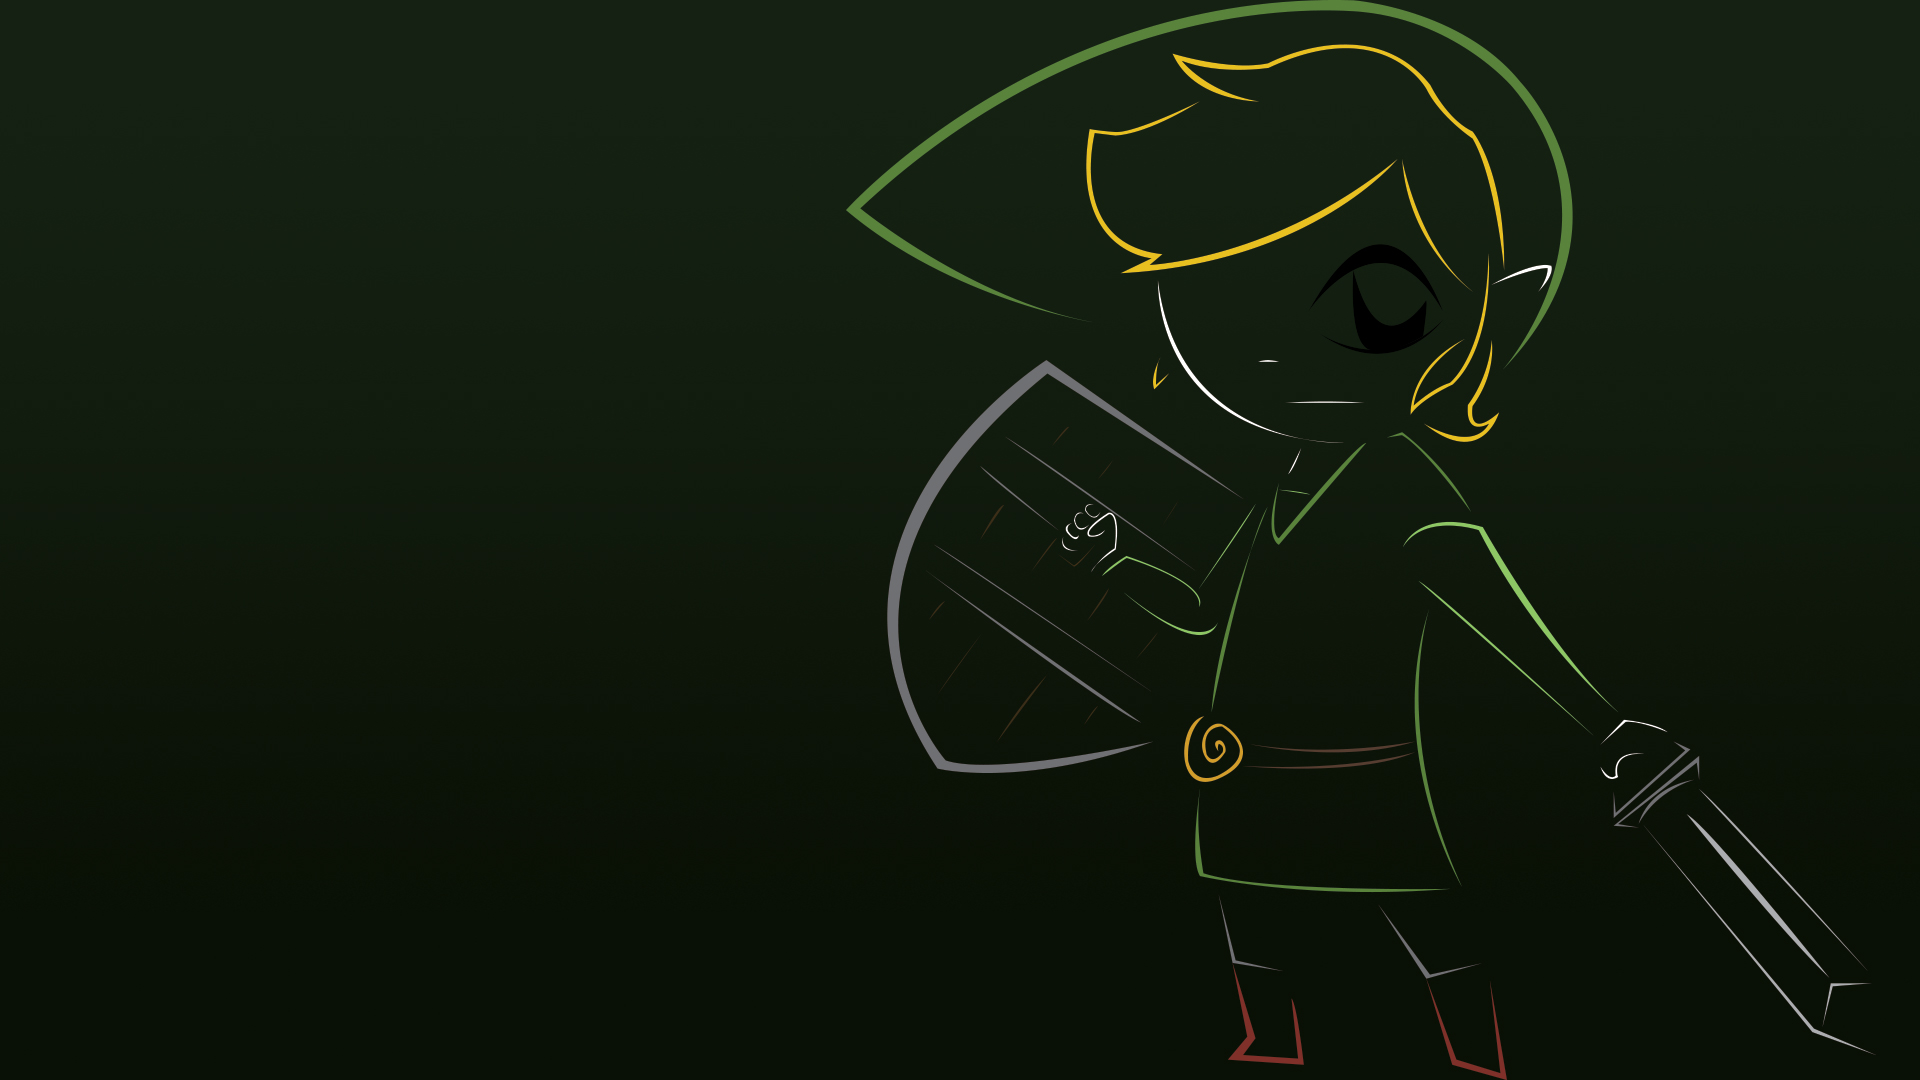 Cool Zelda Wallpapers - WallpaperSafari